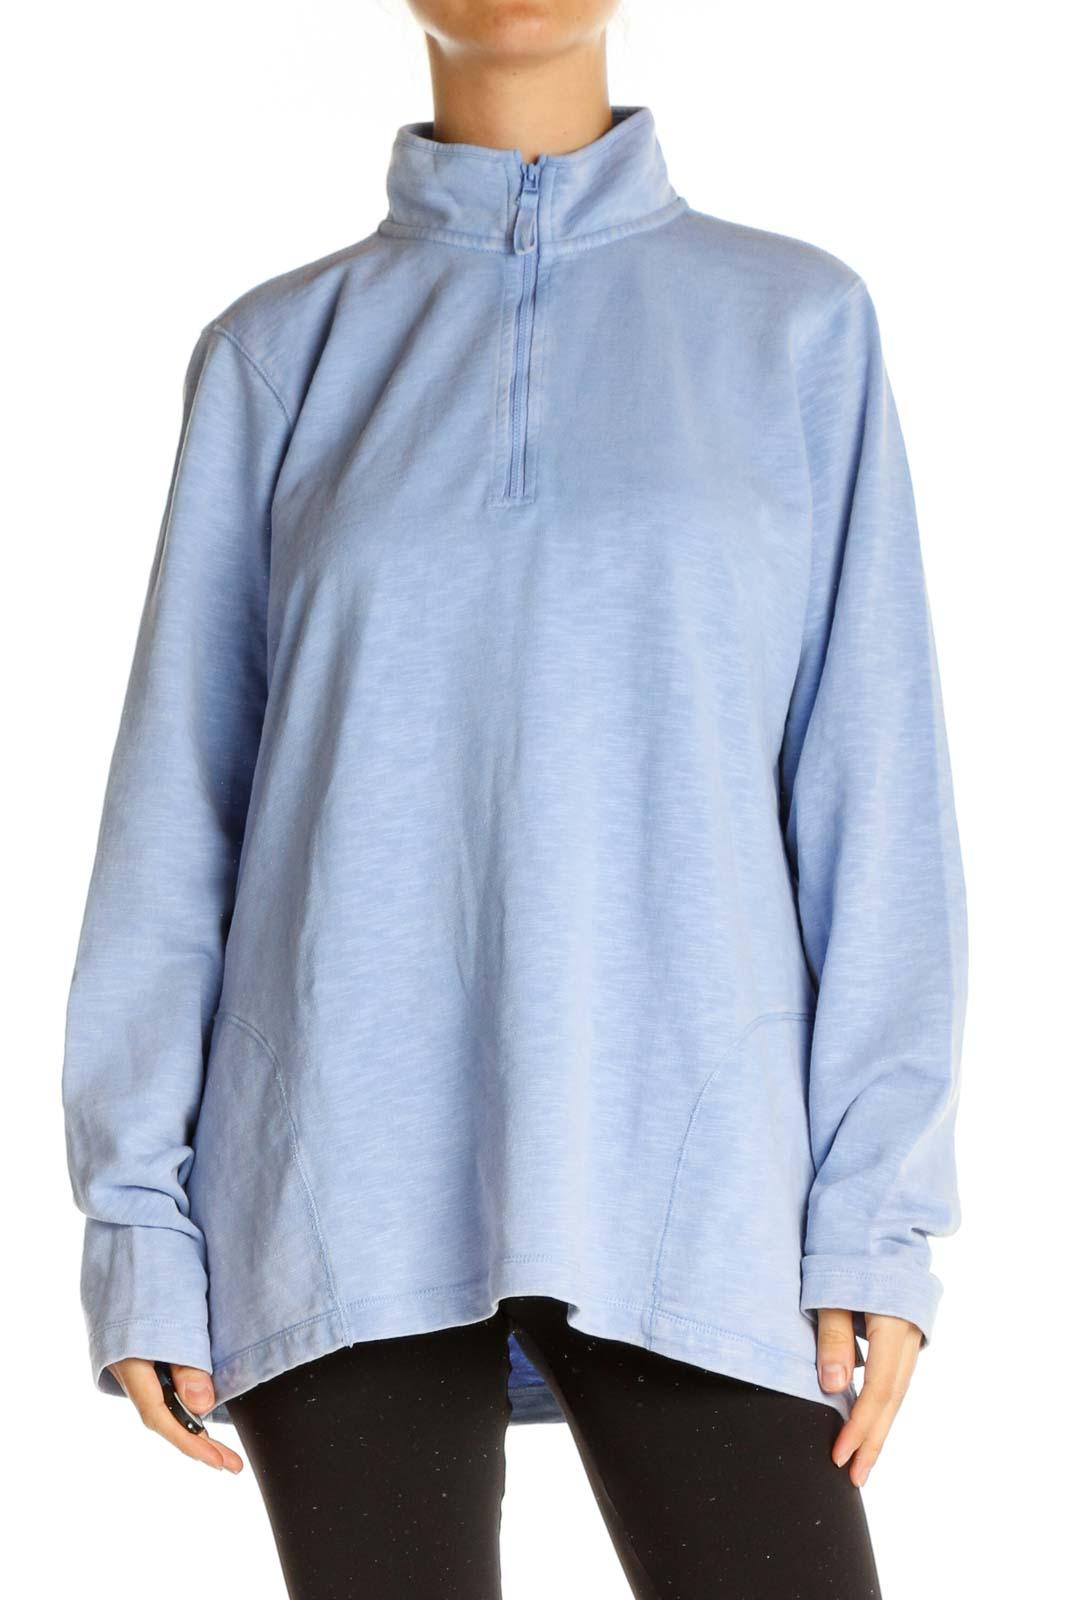 Blue Solid Sweatshirt Front